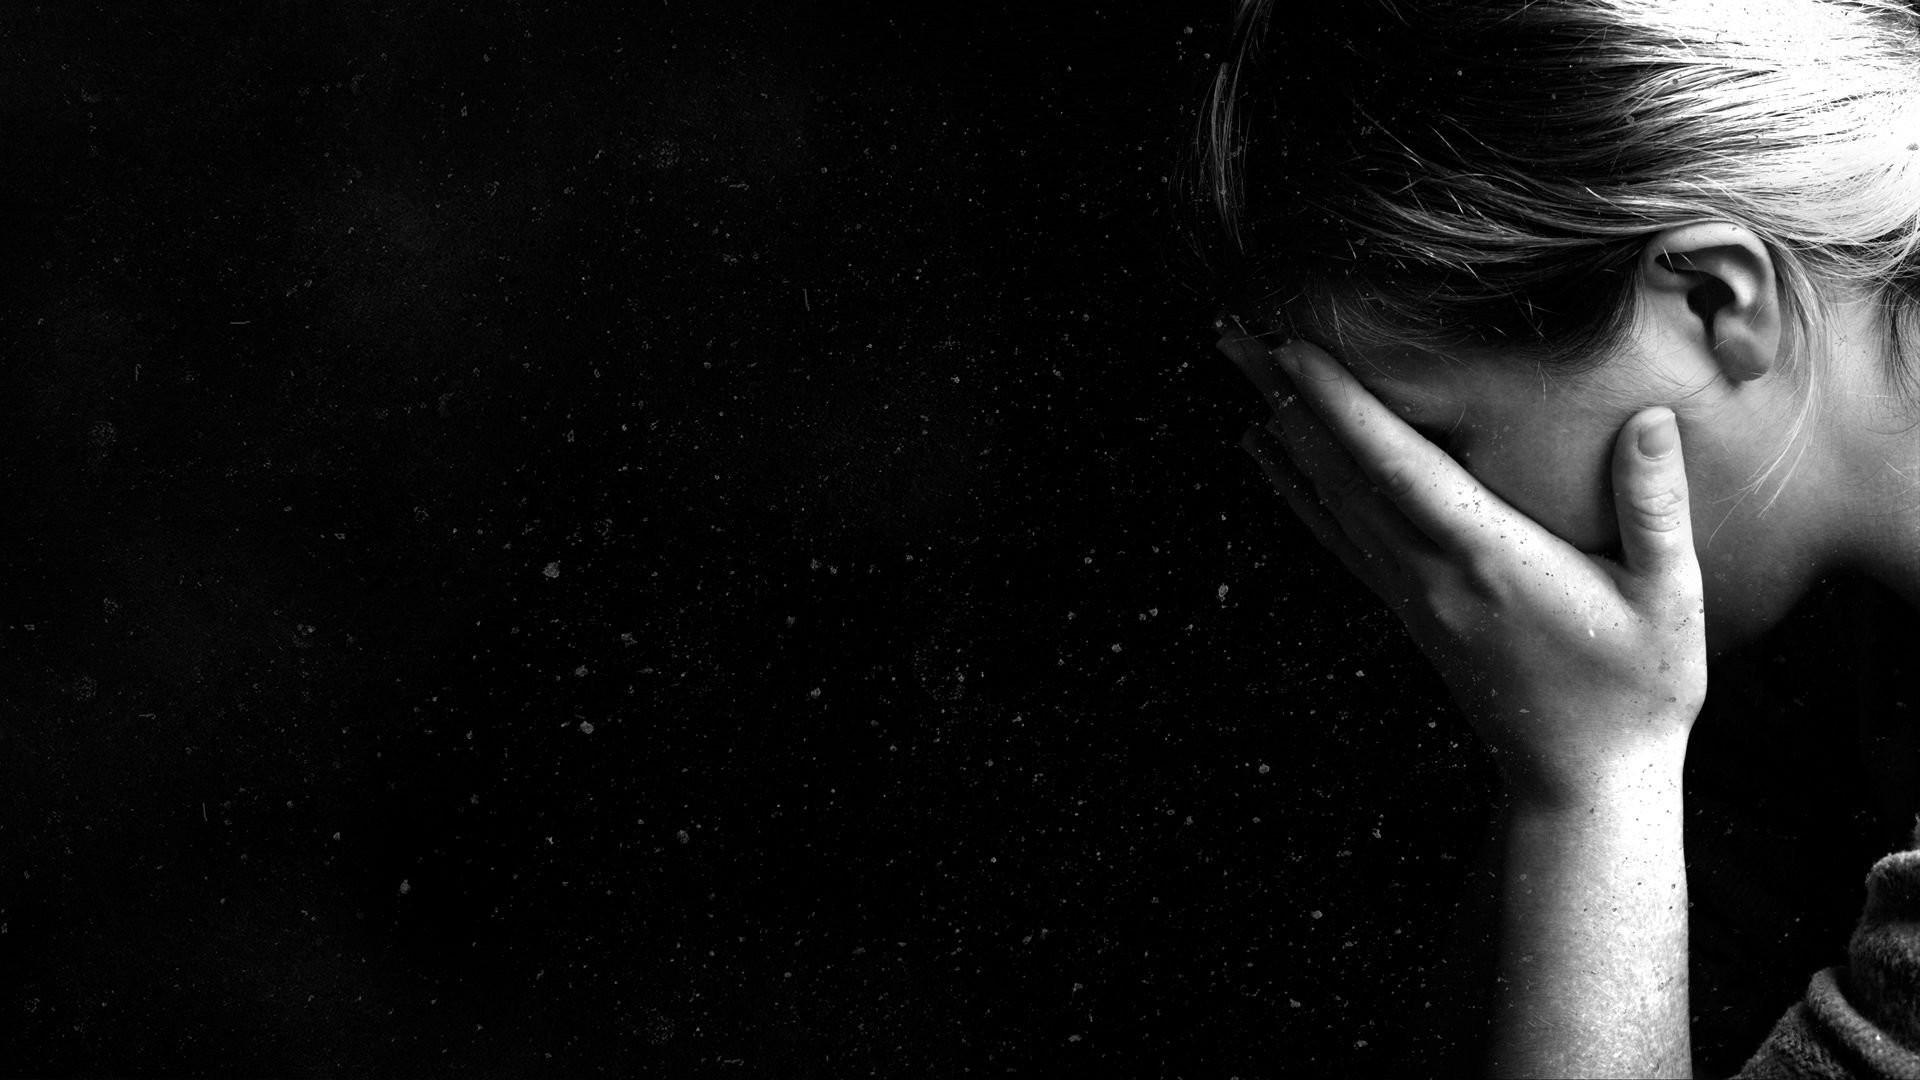 1920x1080 Depression Sad Mood Sorrow Dark People Wallpaper At Wallpapers